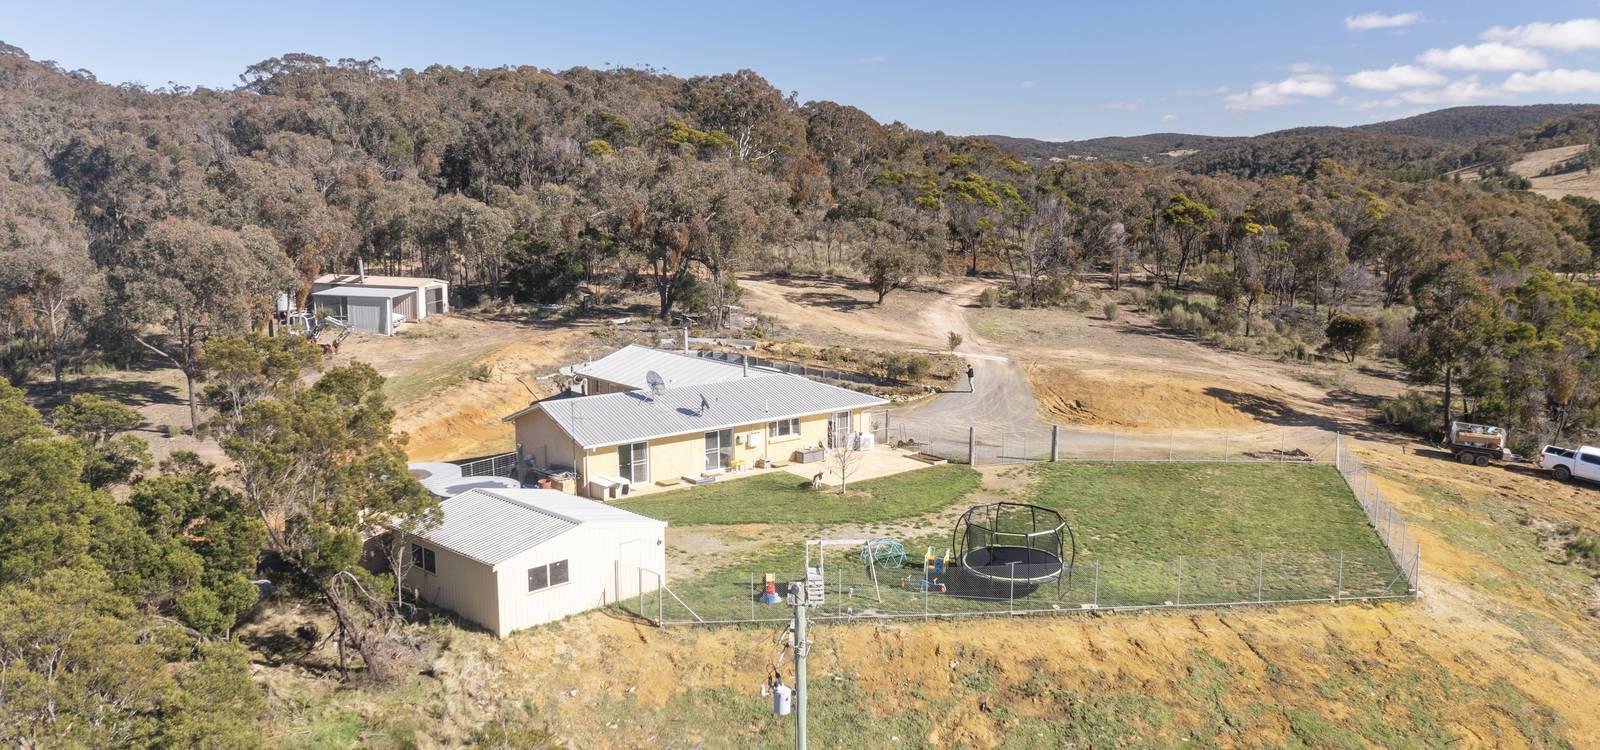 355 Covan Creek Road GOULBURN, NSW 2580 - photo 1